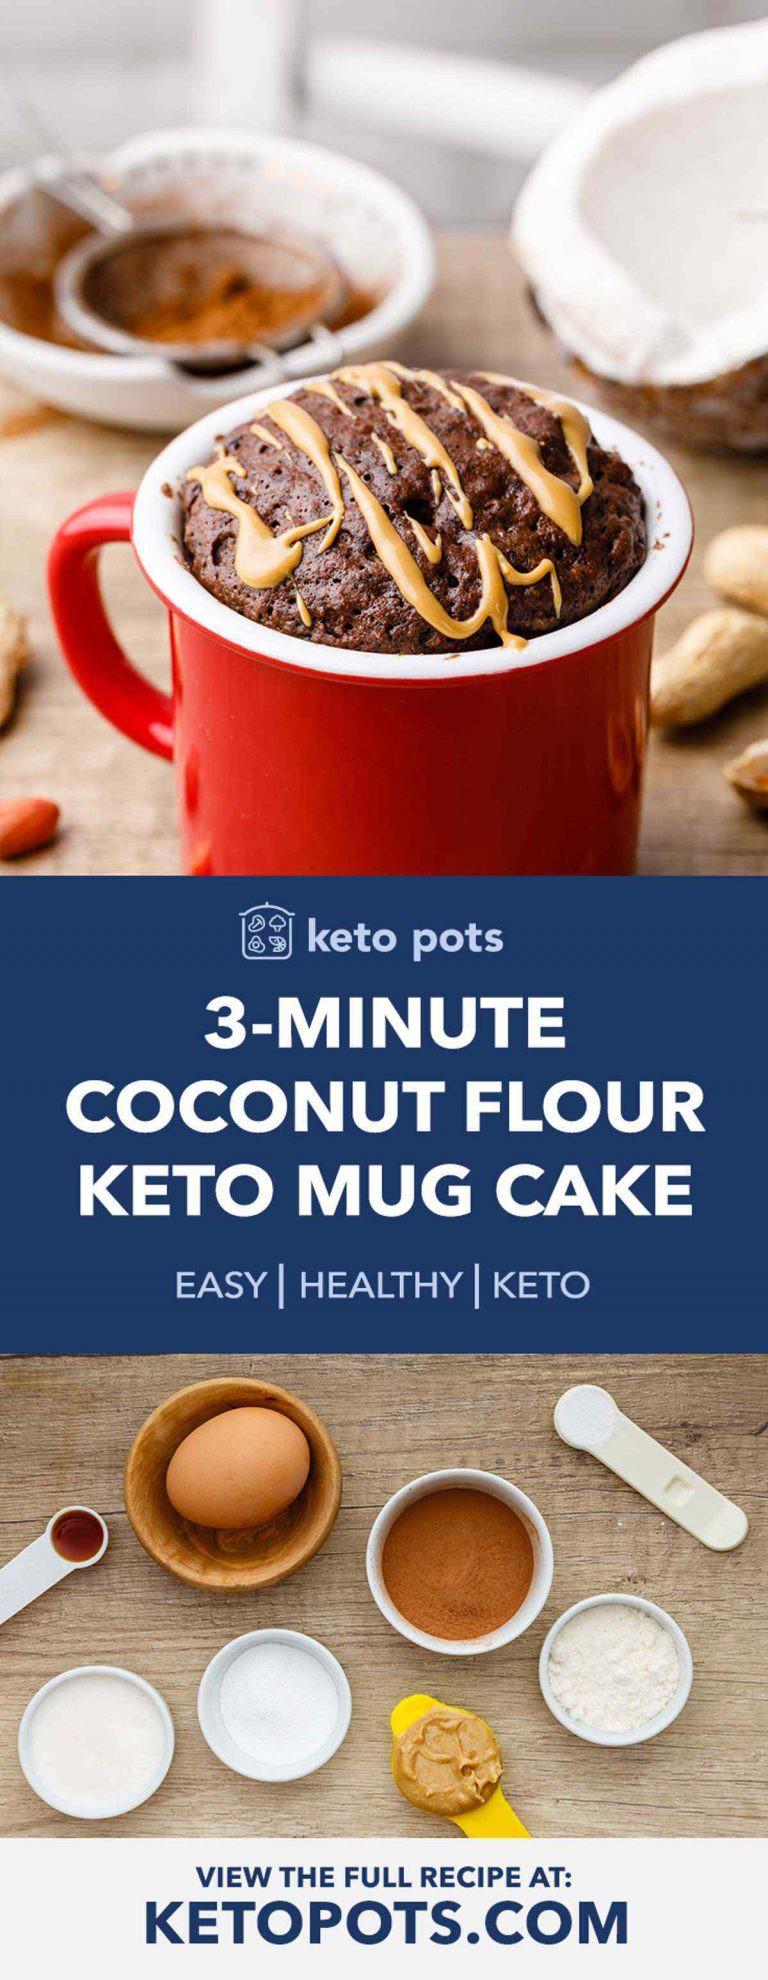 3 Minute Coconut Flour Mug Cake Keto Friendly And Low Carb Amy Copy Me That